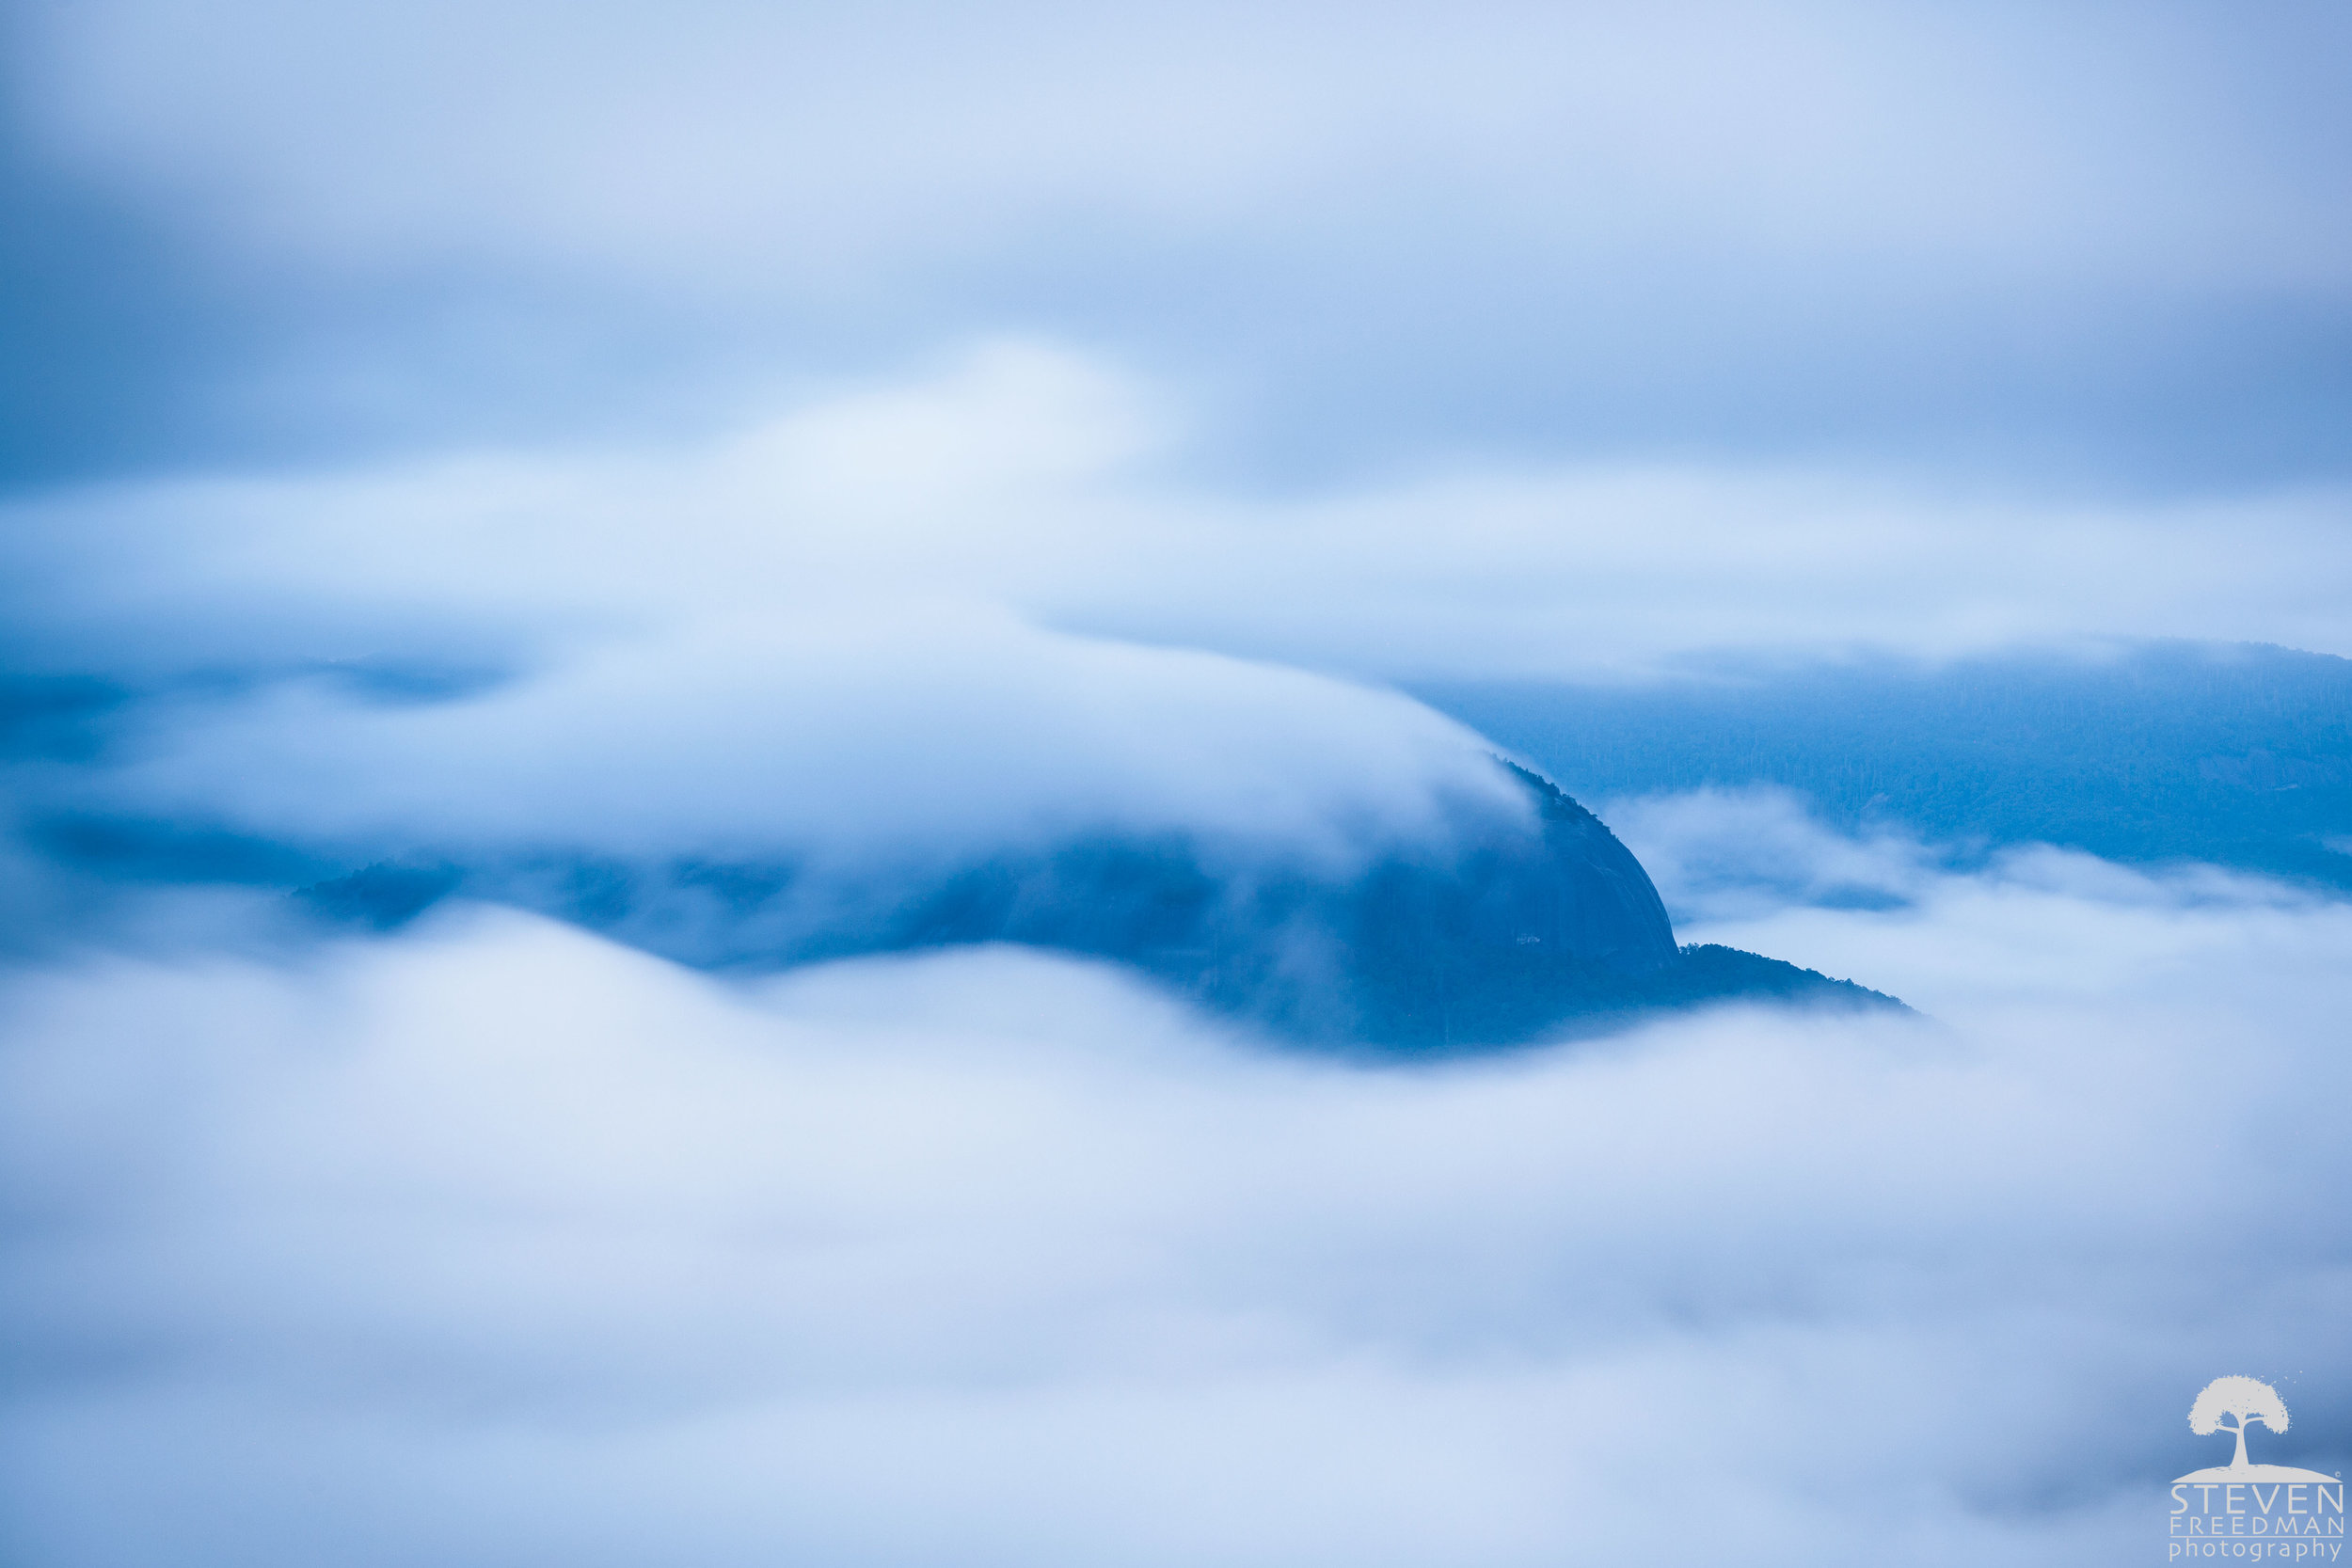 Looking Glass Rock Shrouded in Fog